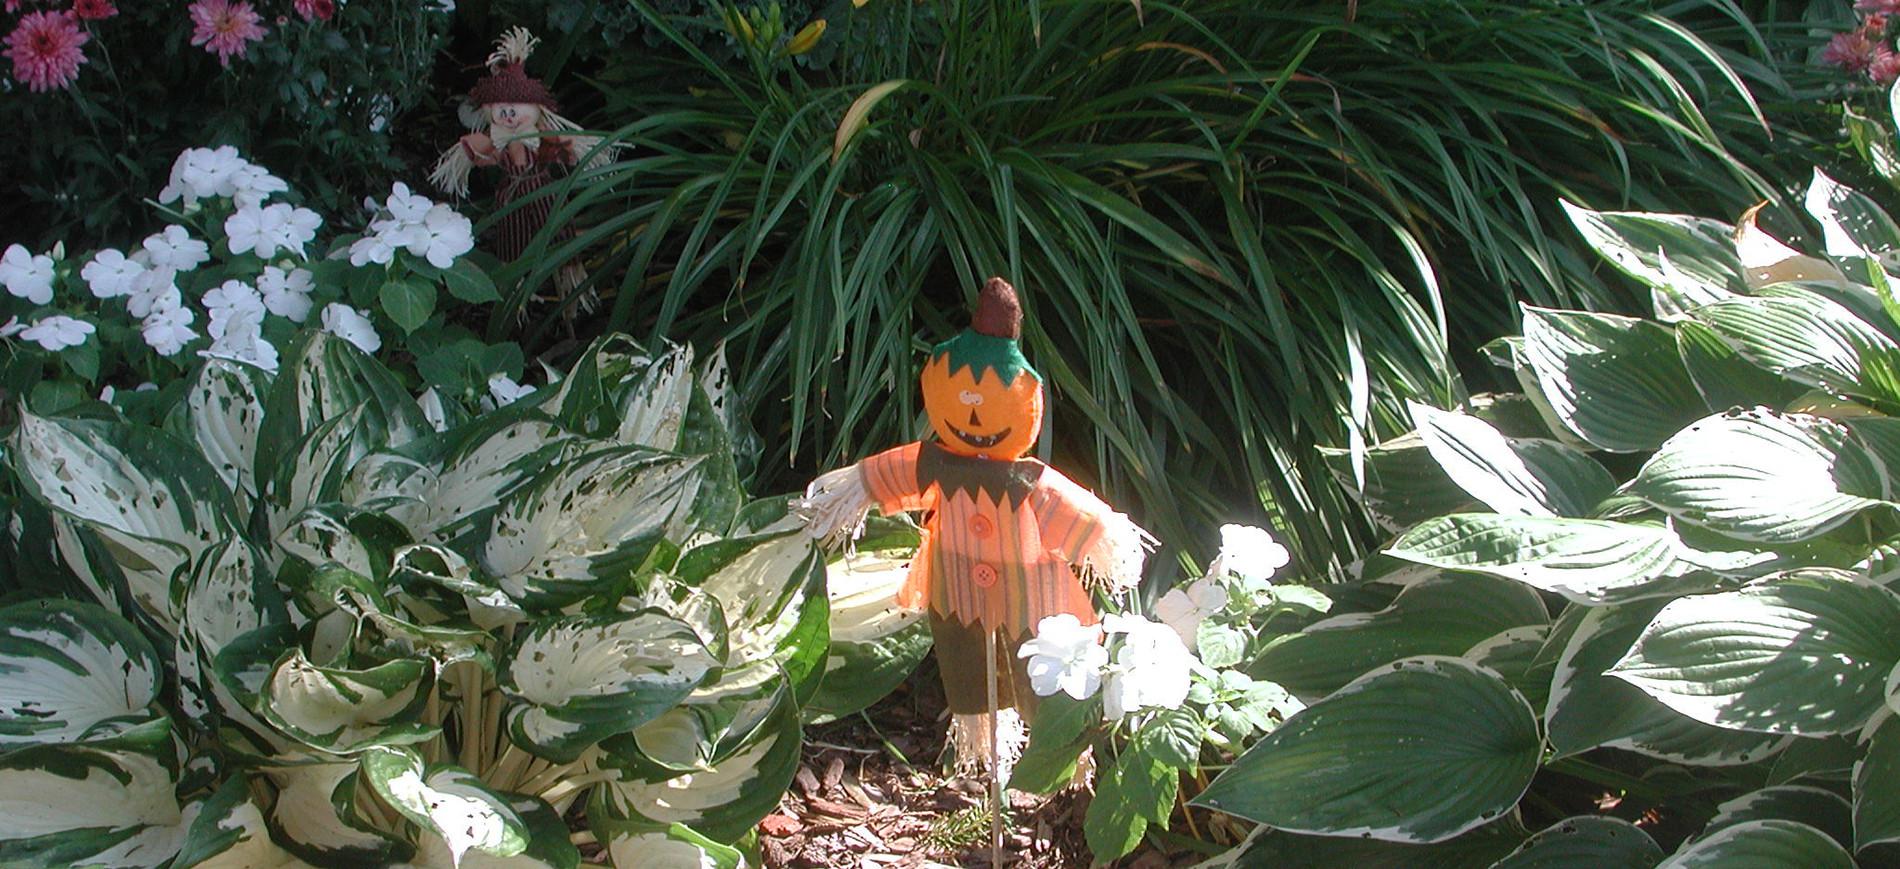 Toy scarecrow in garden with hosta, daylilies